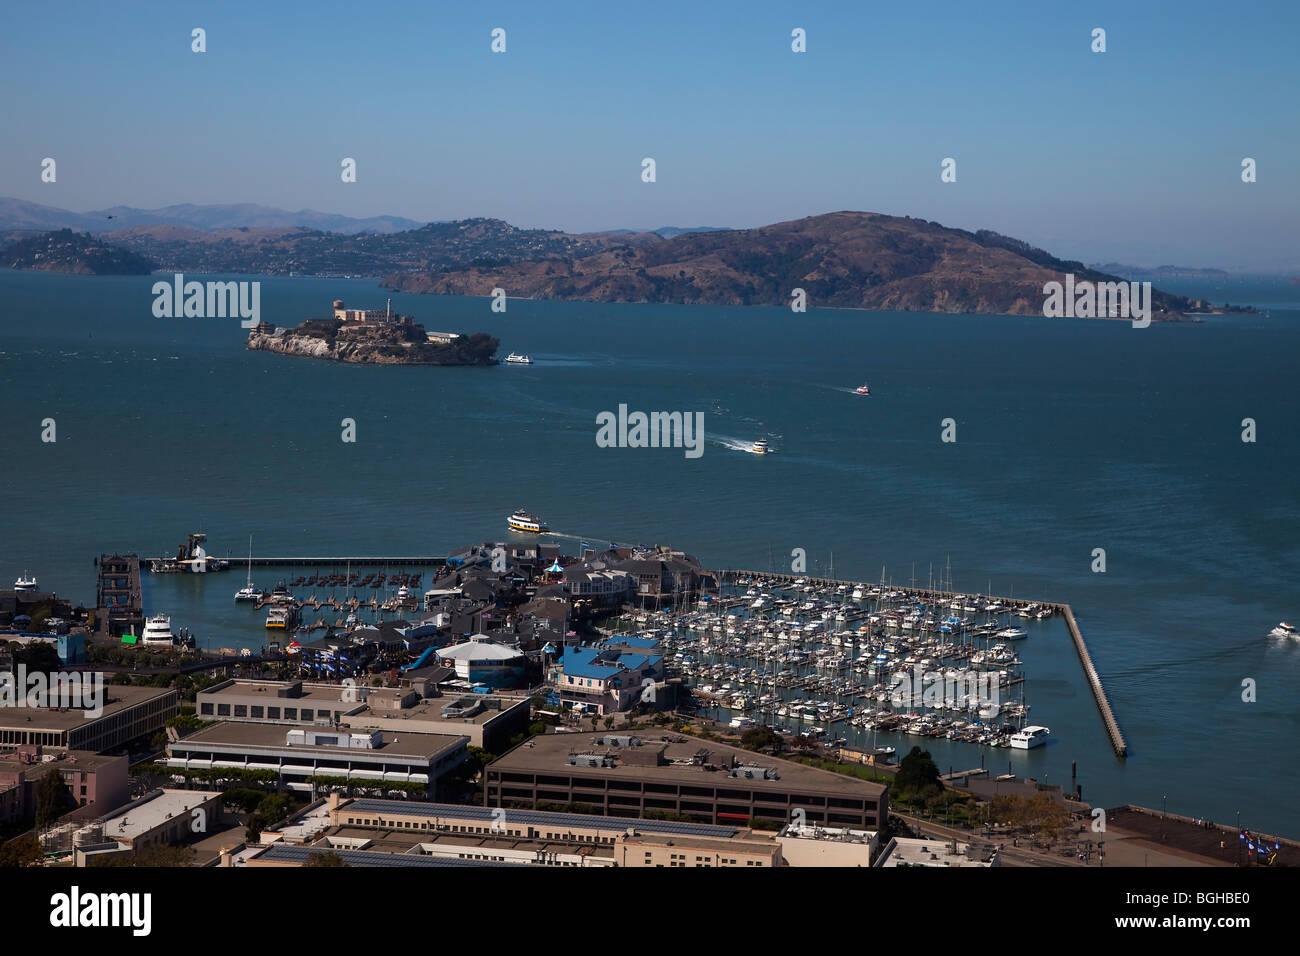 San Francisco Harbour Stockfotos & San Francisco Harbour Bilder - Alamy